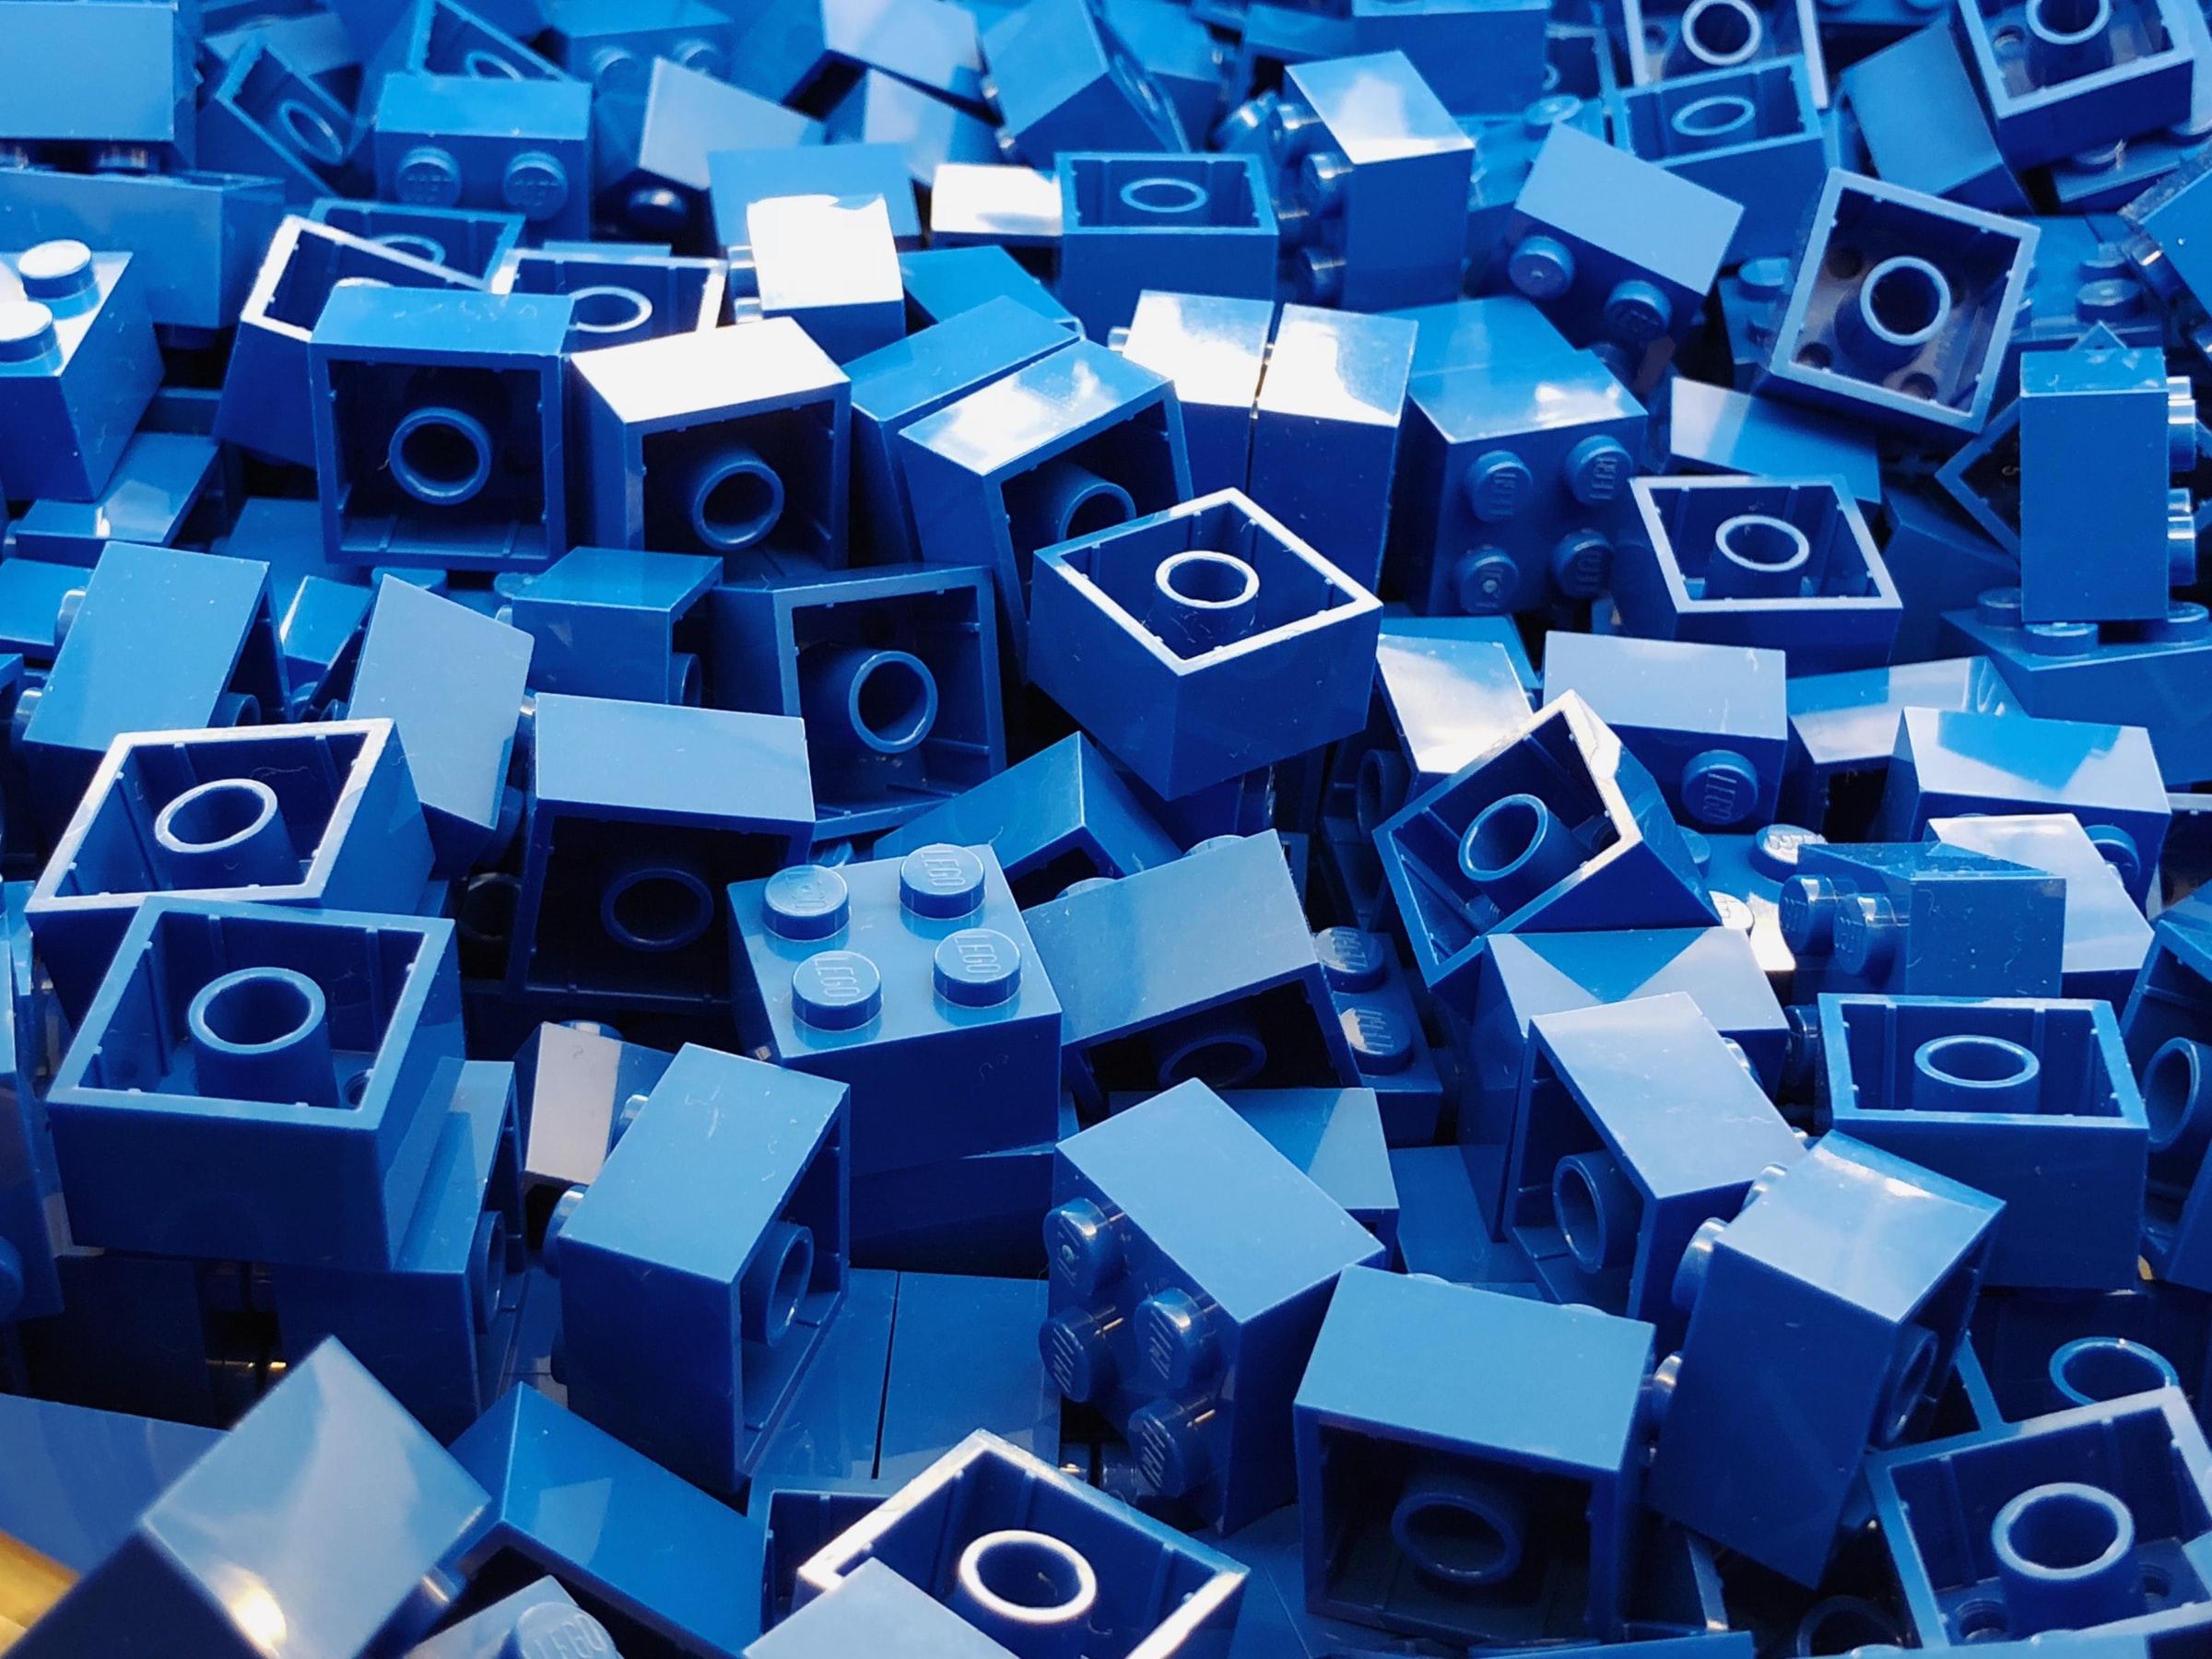 Pile of large square blue legos.